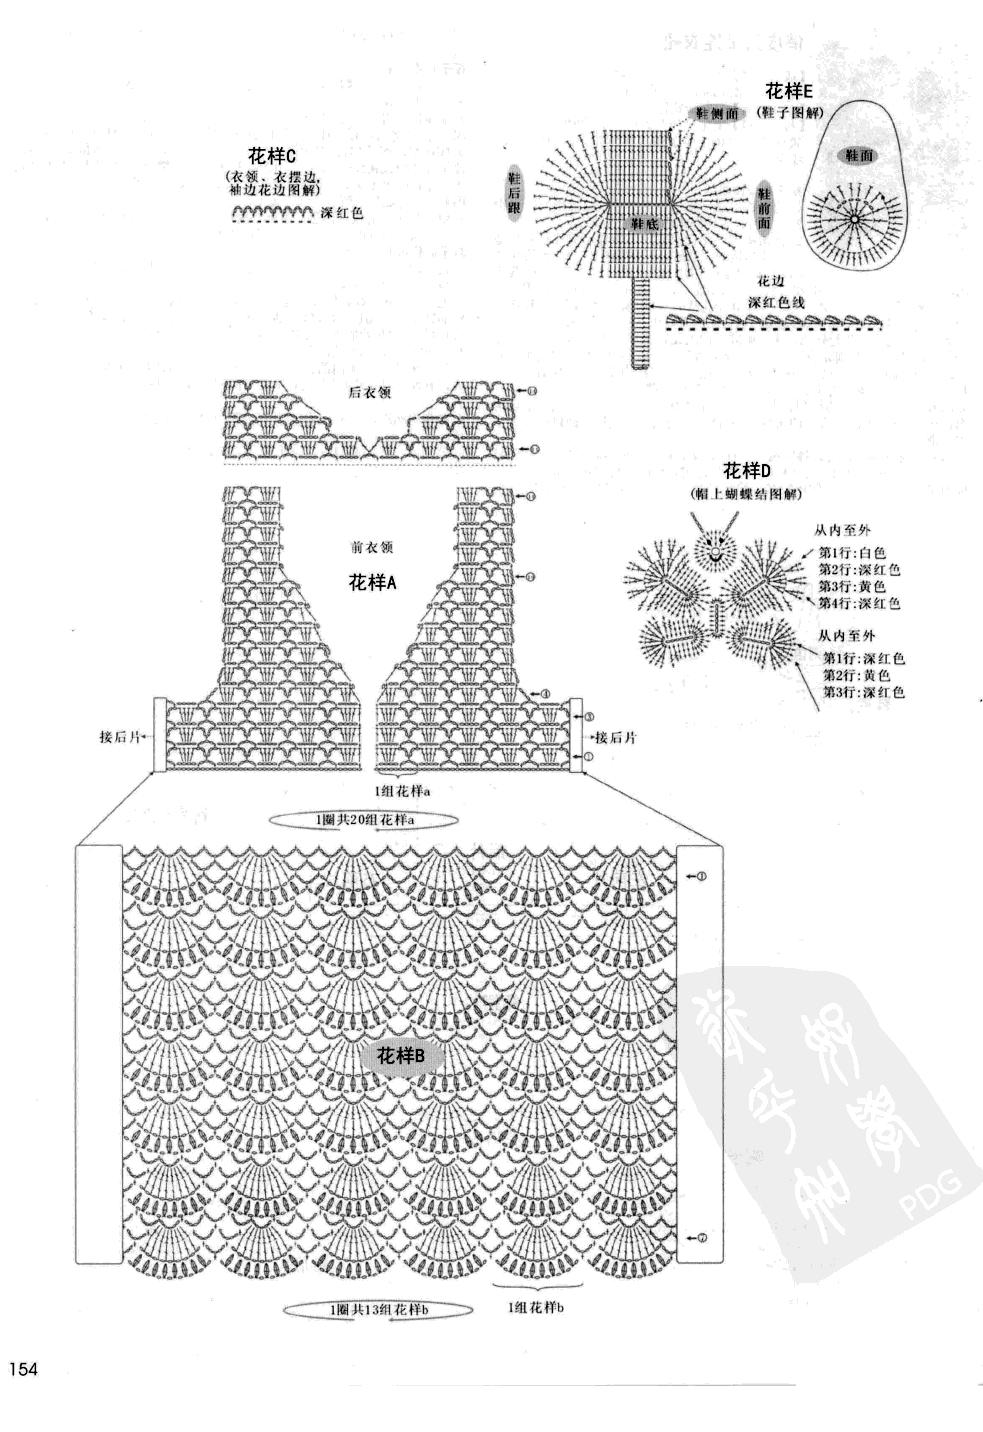 p (154).jpg